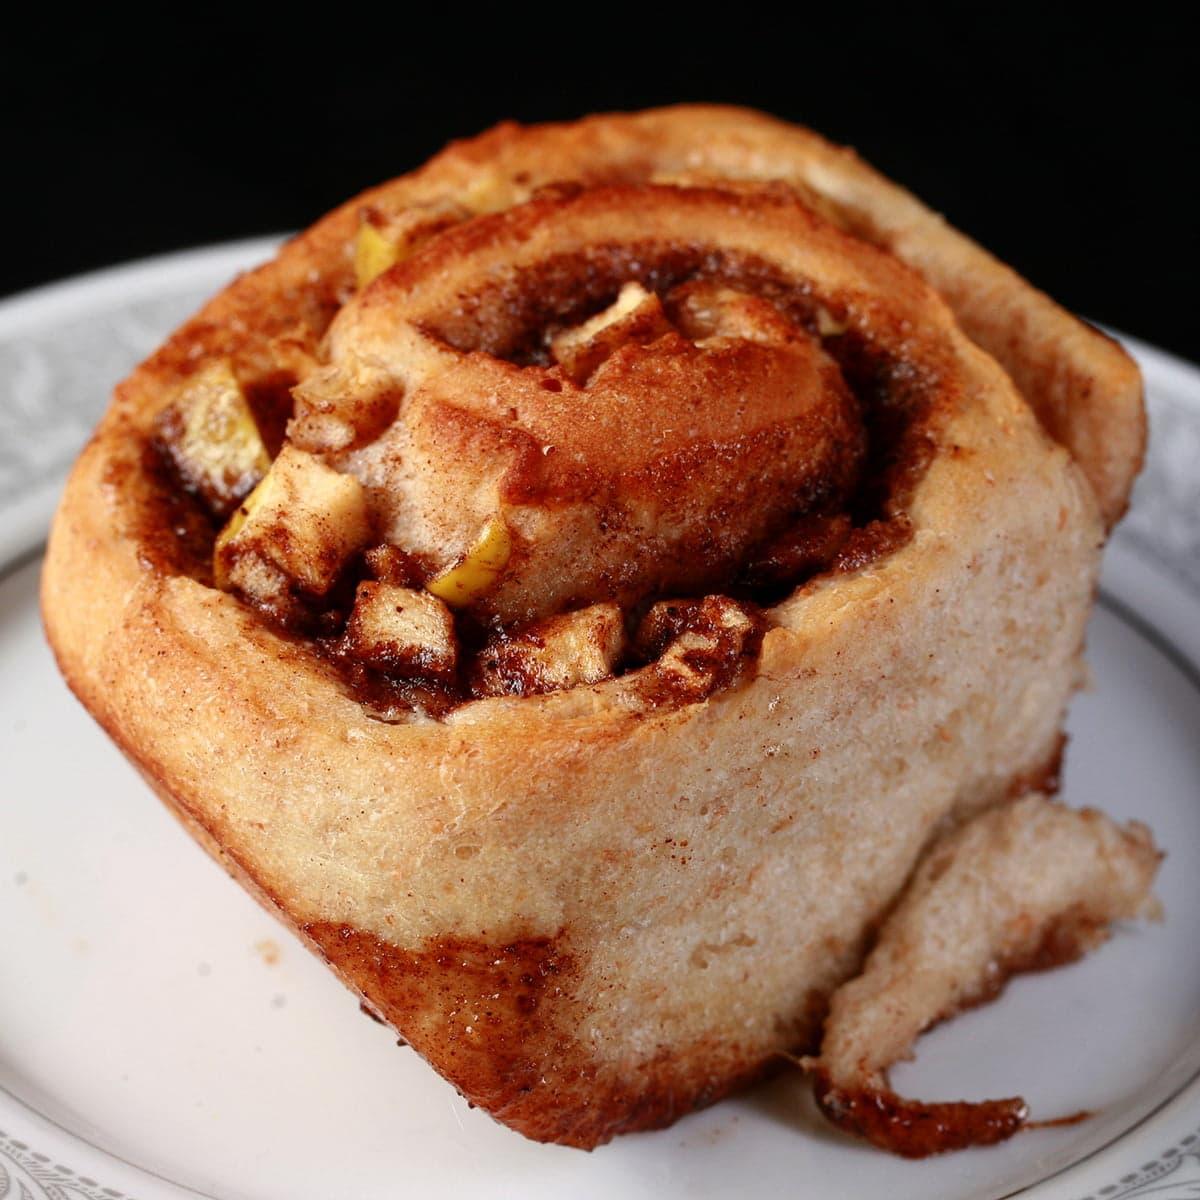 Close up photo of an apple cinnamon bun - a cinnamon bun, with small pieces of apple throughout the cinnamon swirl.